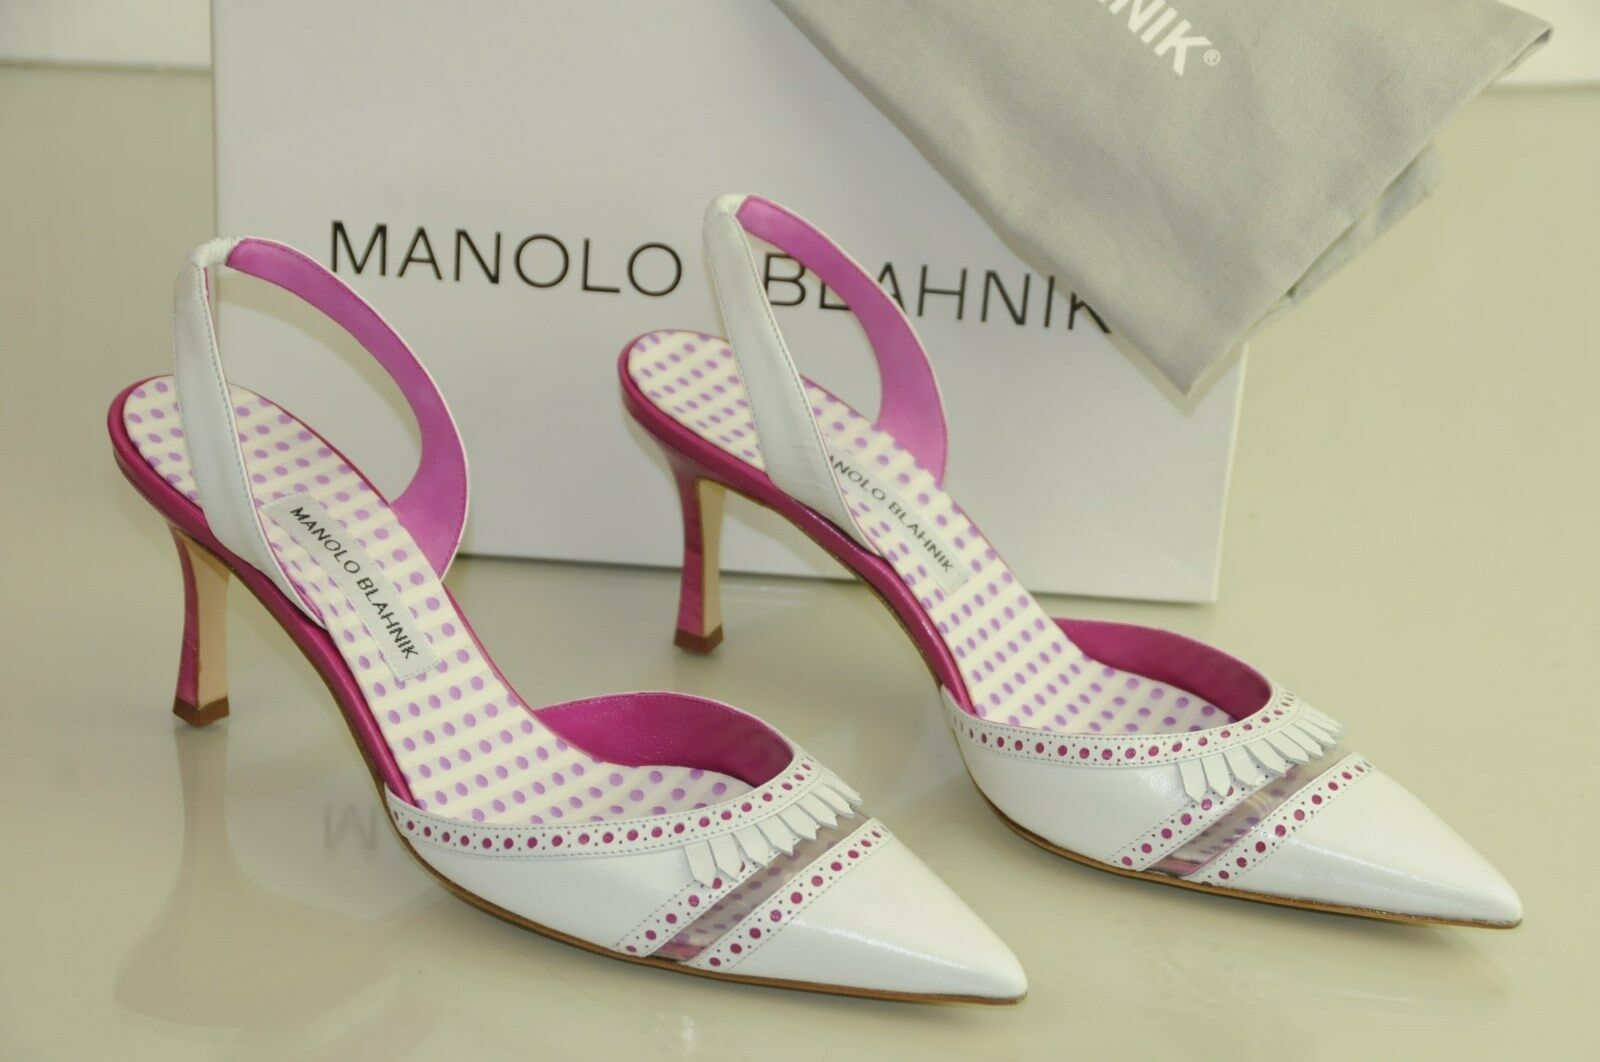 prezzo ragionevole  945 New Manolo Manolo Manolo Blahnik PETARDA bianca rosa Dots Carolyne Heels scarpe 40.5  consegna rapida